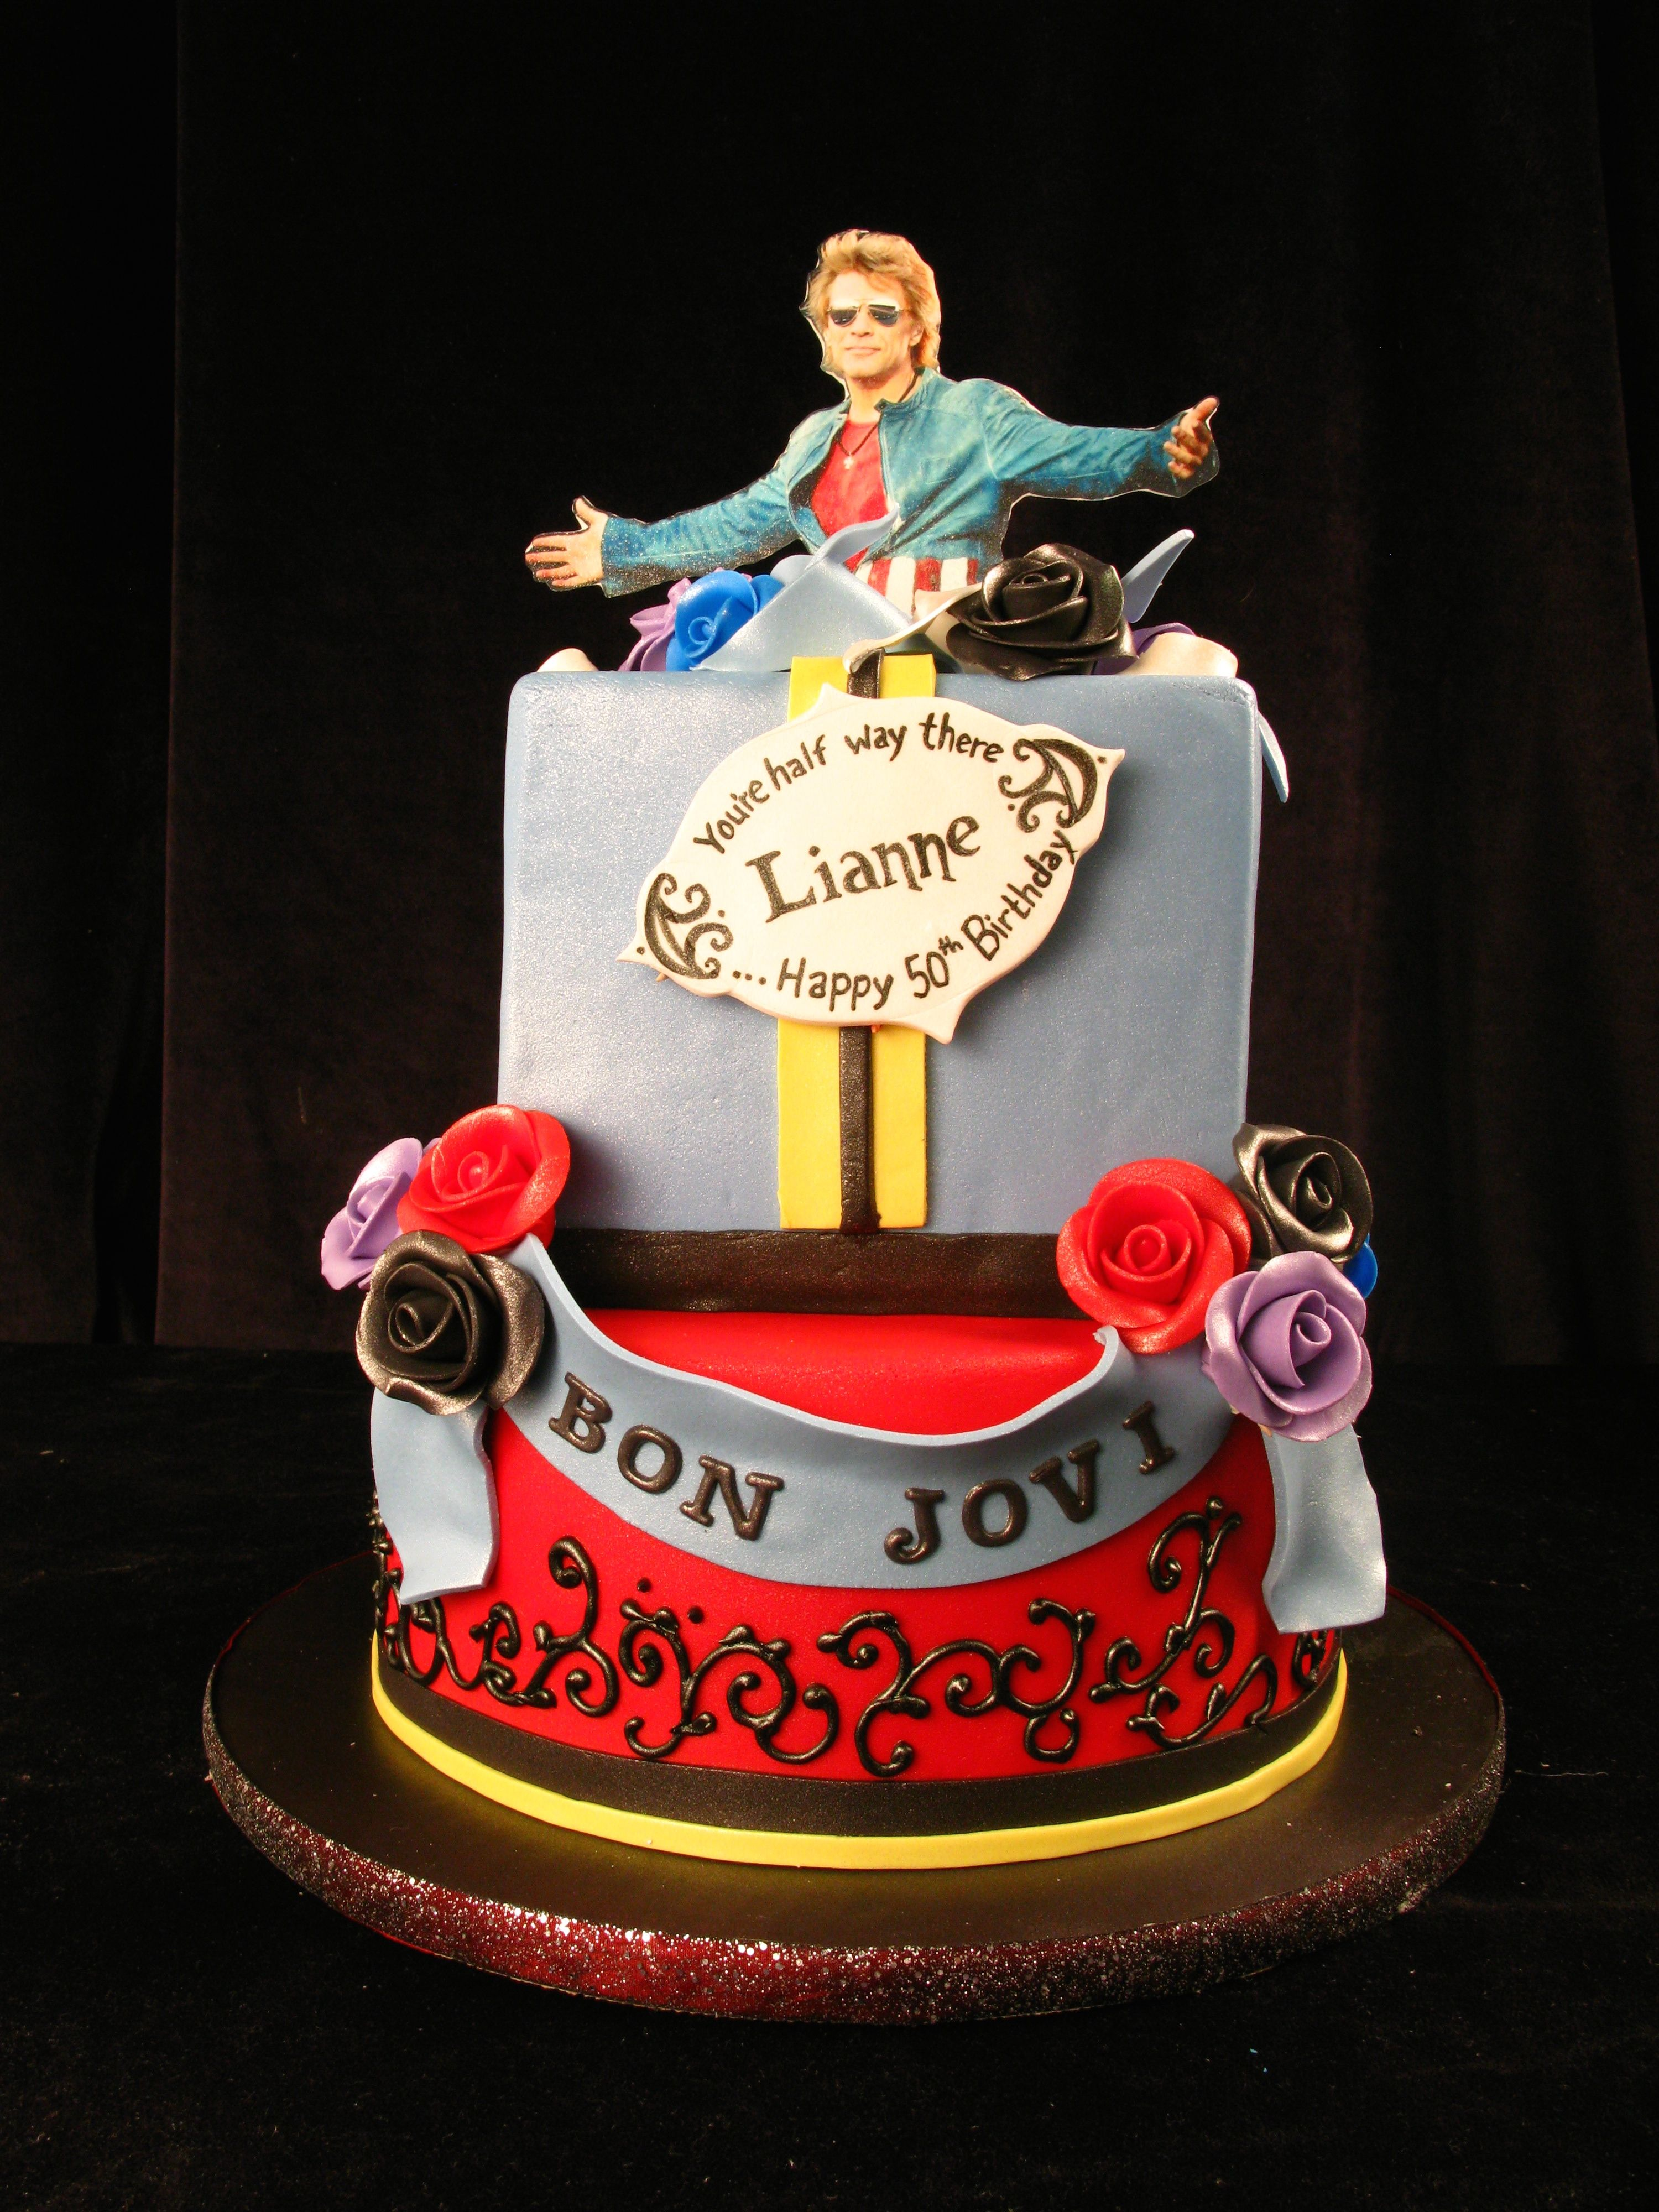 Bon Jovi Rocker Cake Throw Back Cake Present Cake Rock N Roll